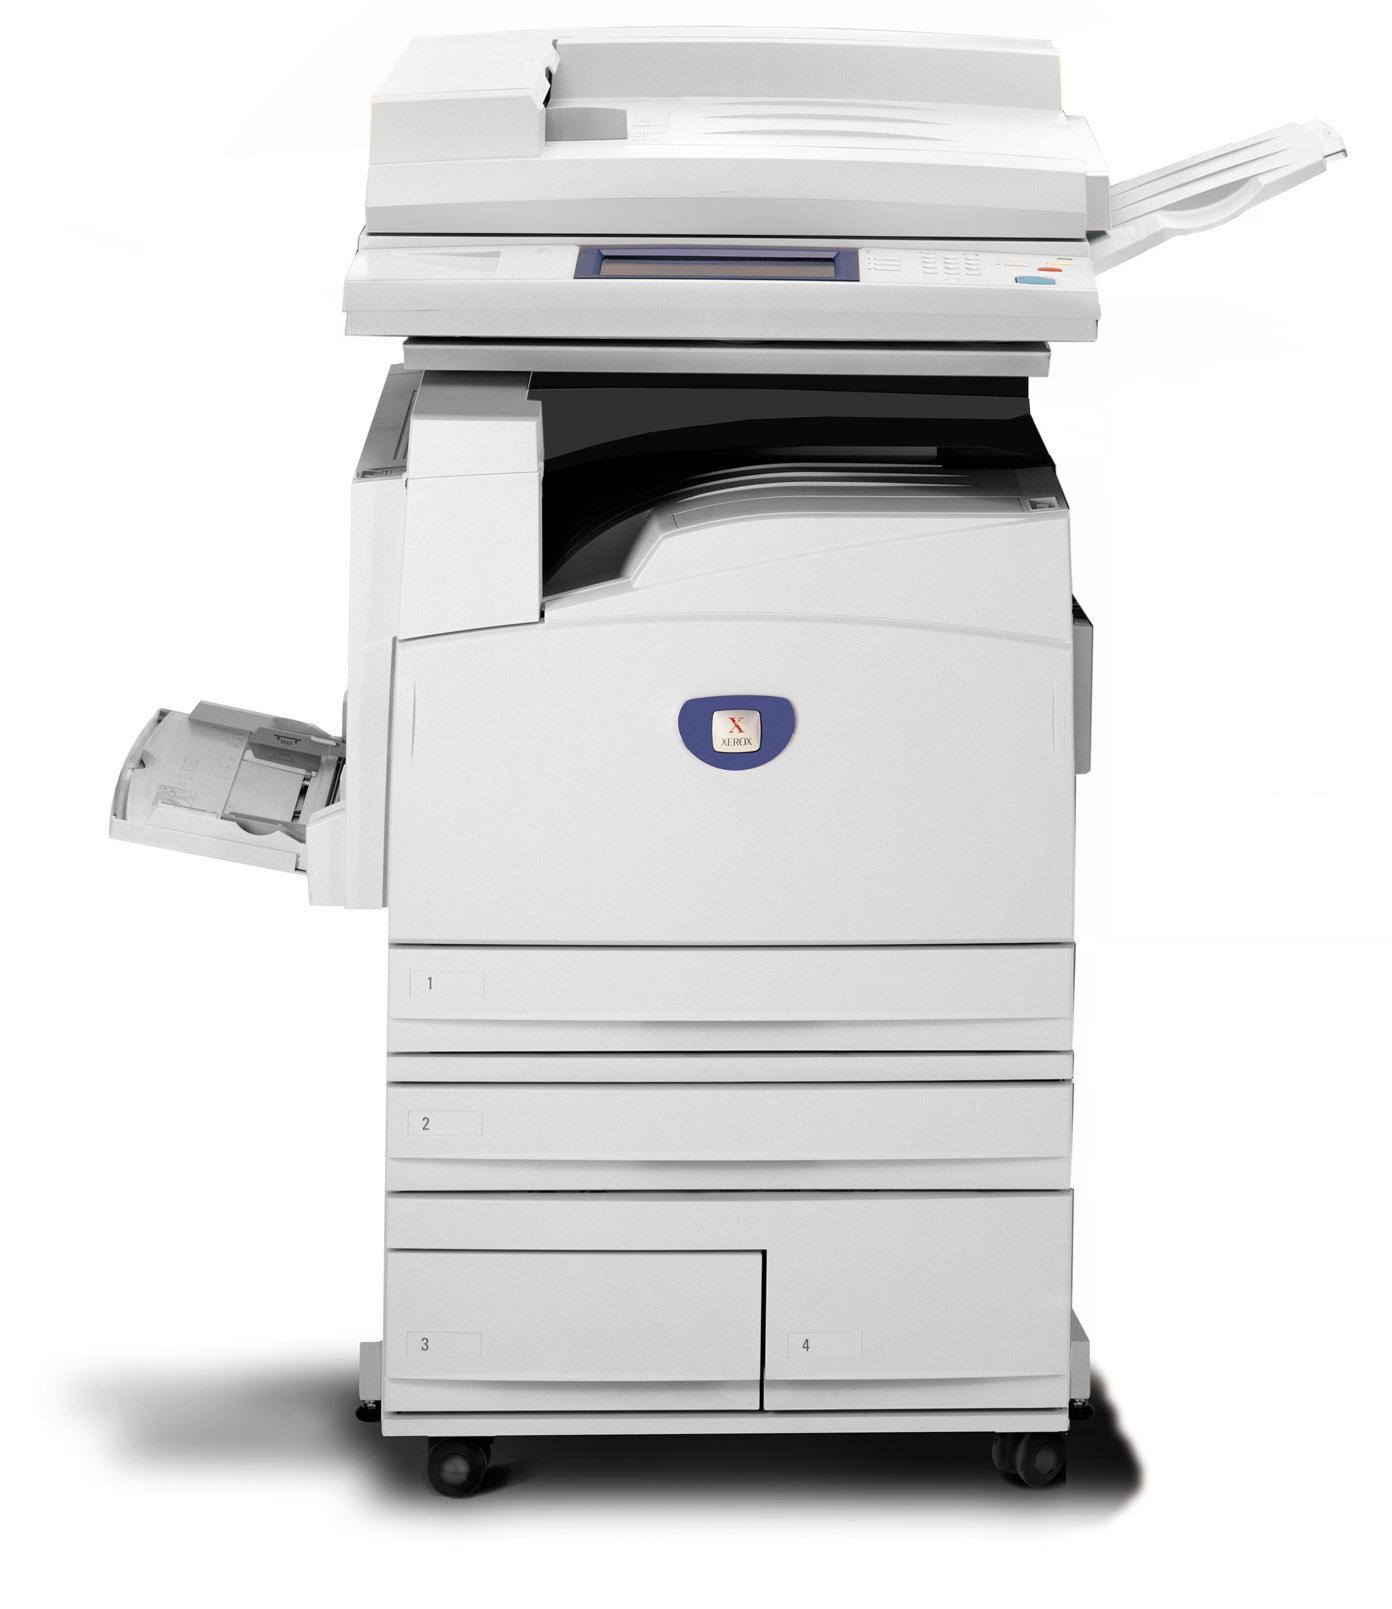 Xerox pe16 scanner driver 64 bit for Bureau 64 xerox